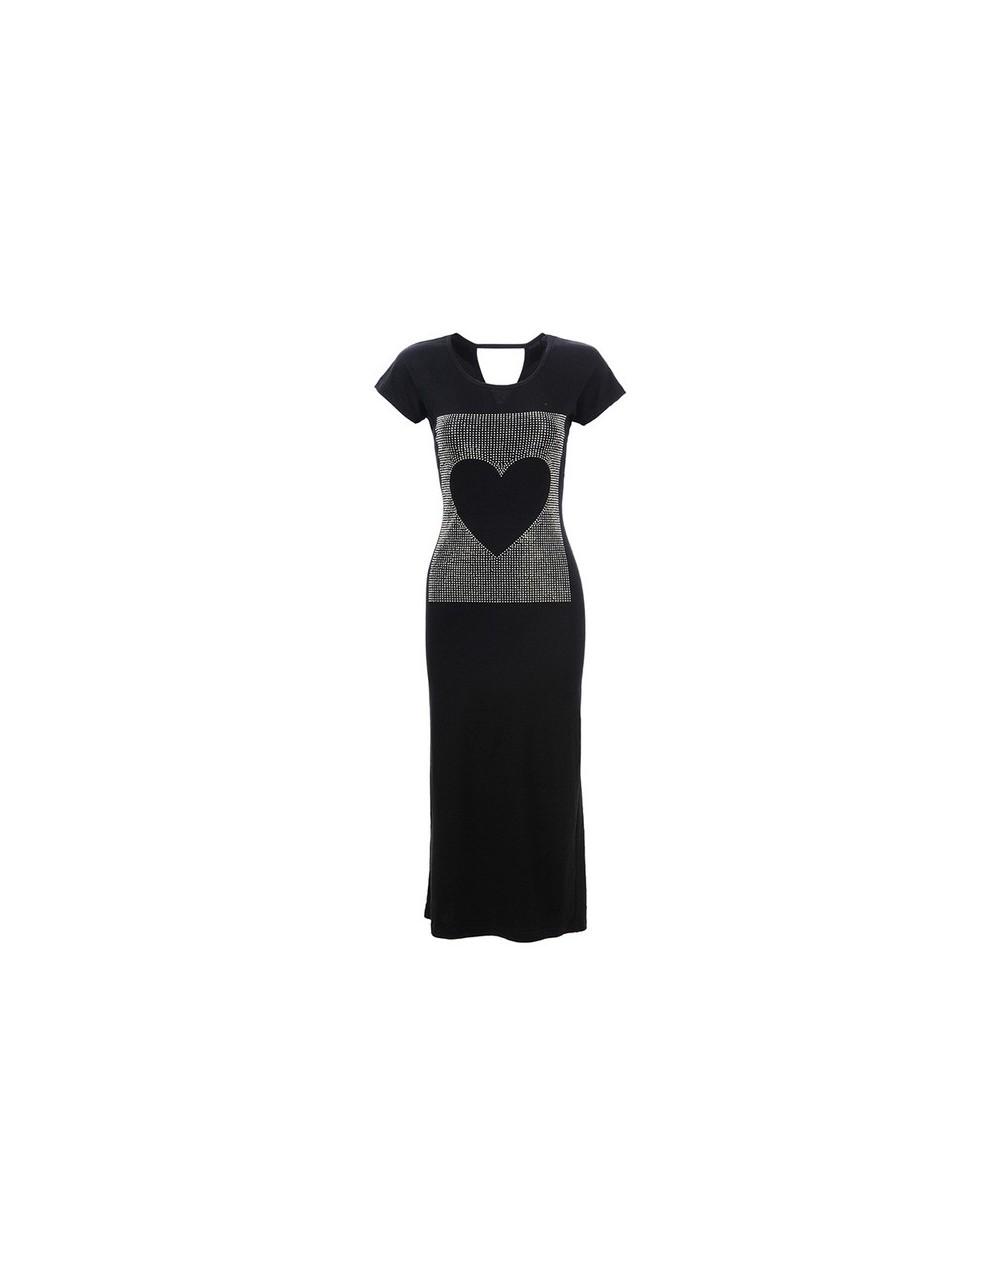 2018 New Arrival Short Sleeve Summer Dress Print Women Dresses Ladies High Street Fashionable Casual Dress WYQ-1379 - Black ...